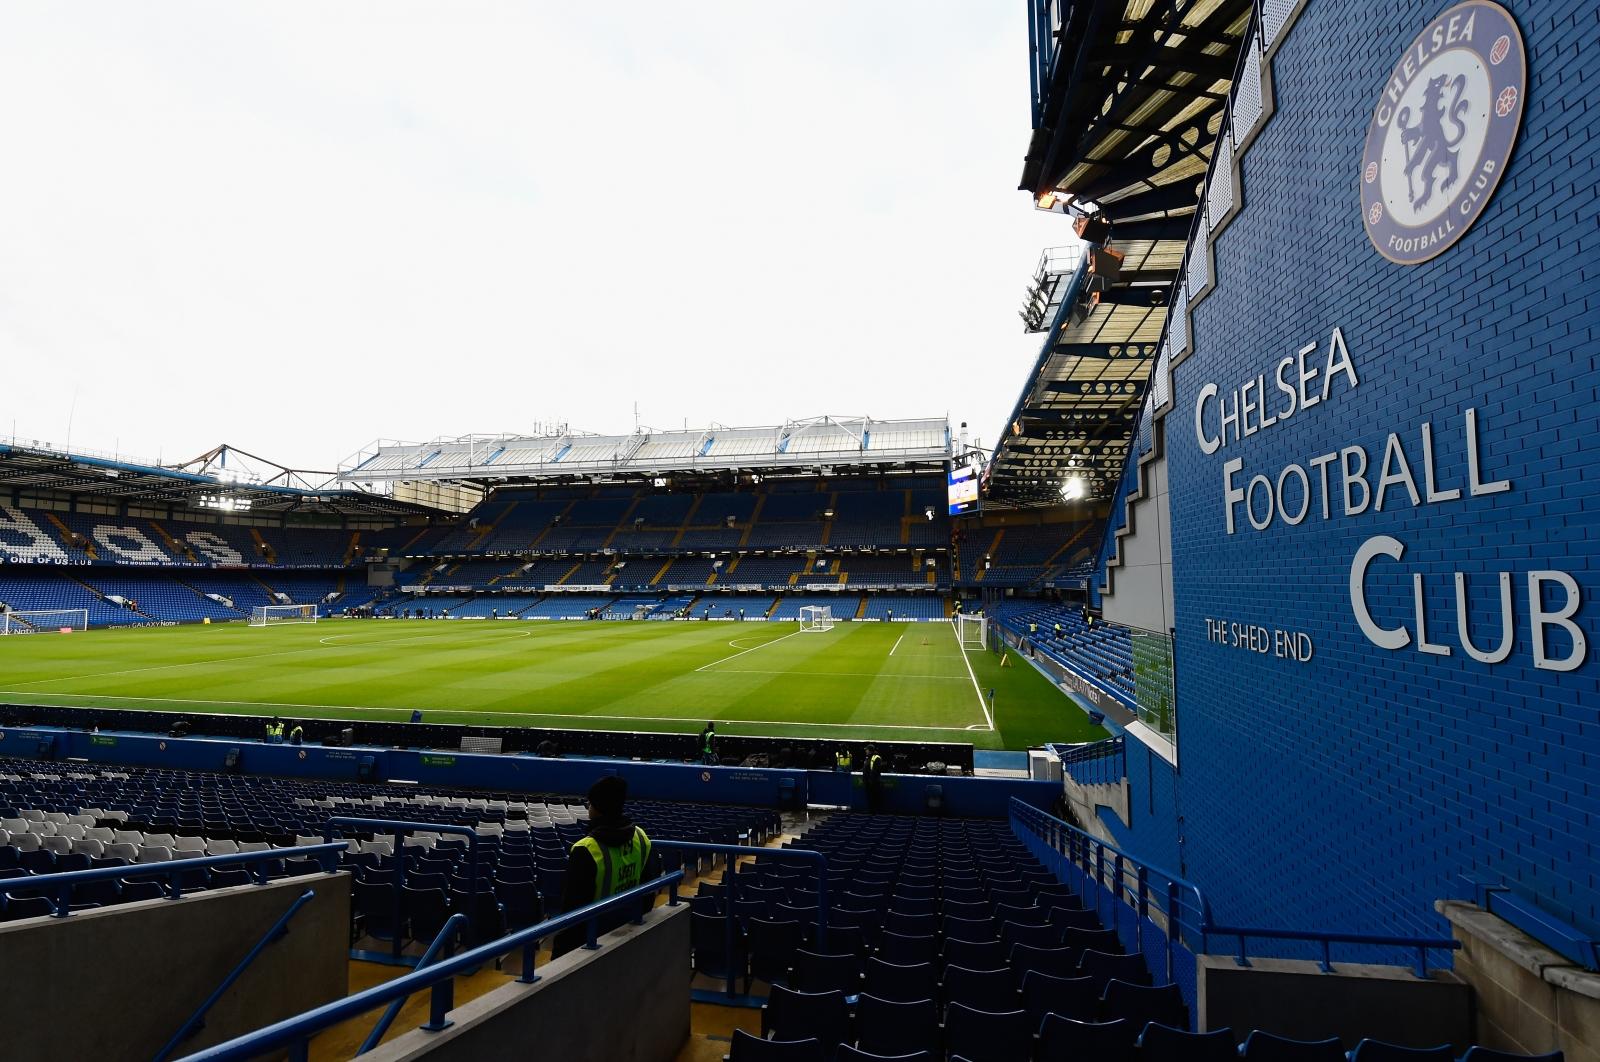 Chelsea Update Stamford Bridge Development Plans As Local